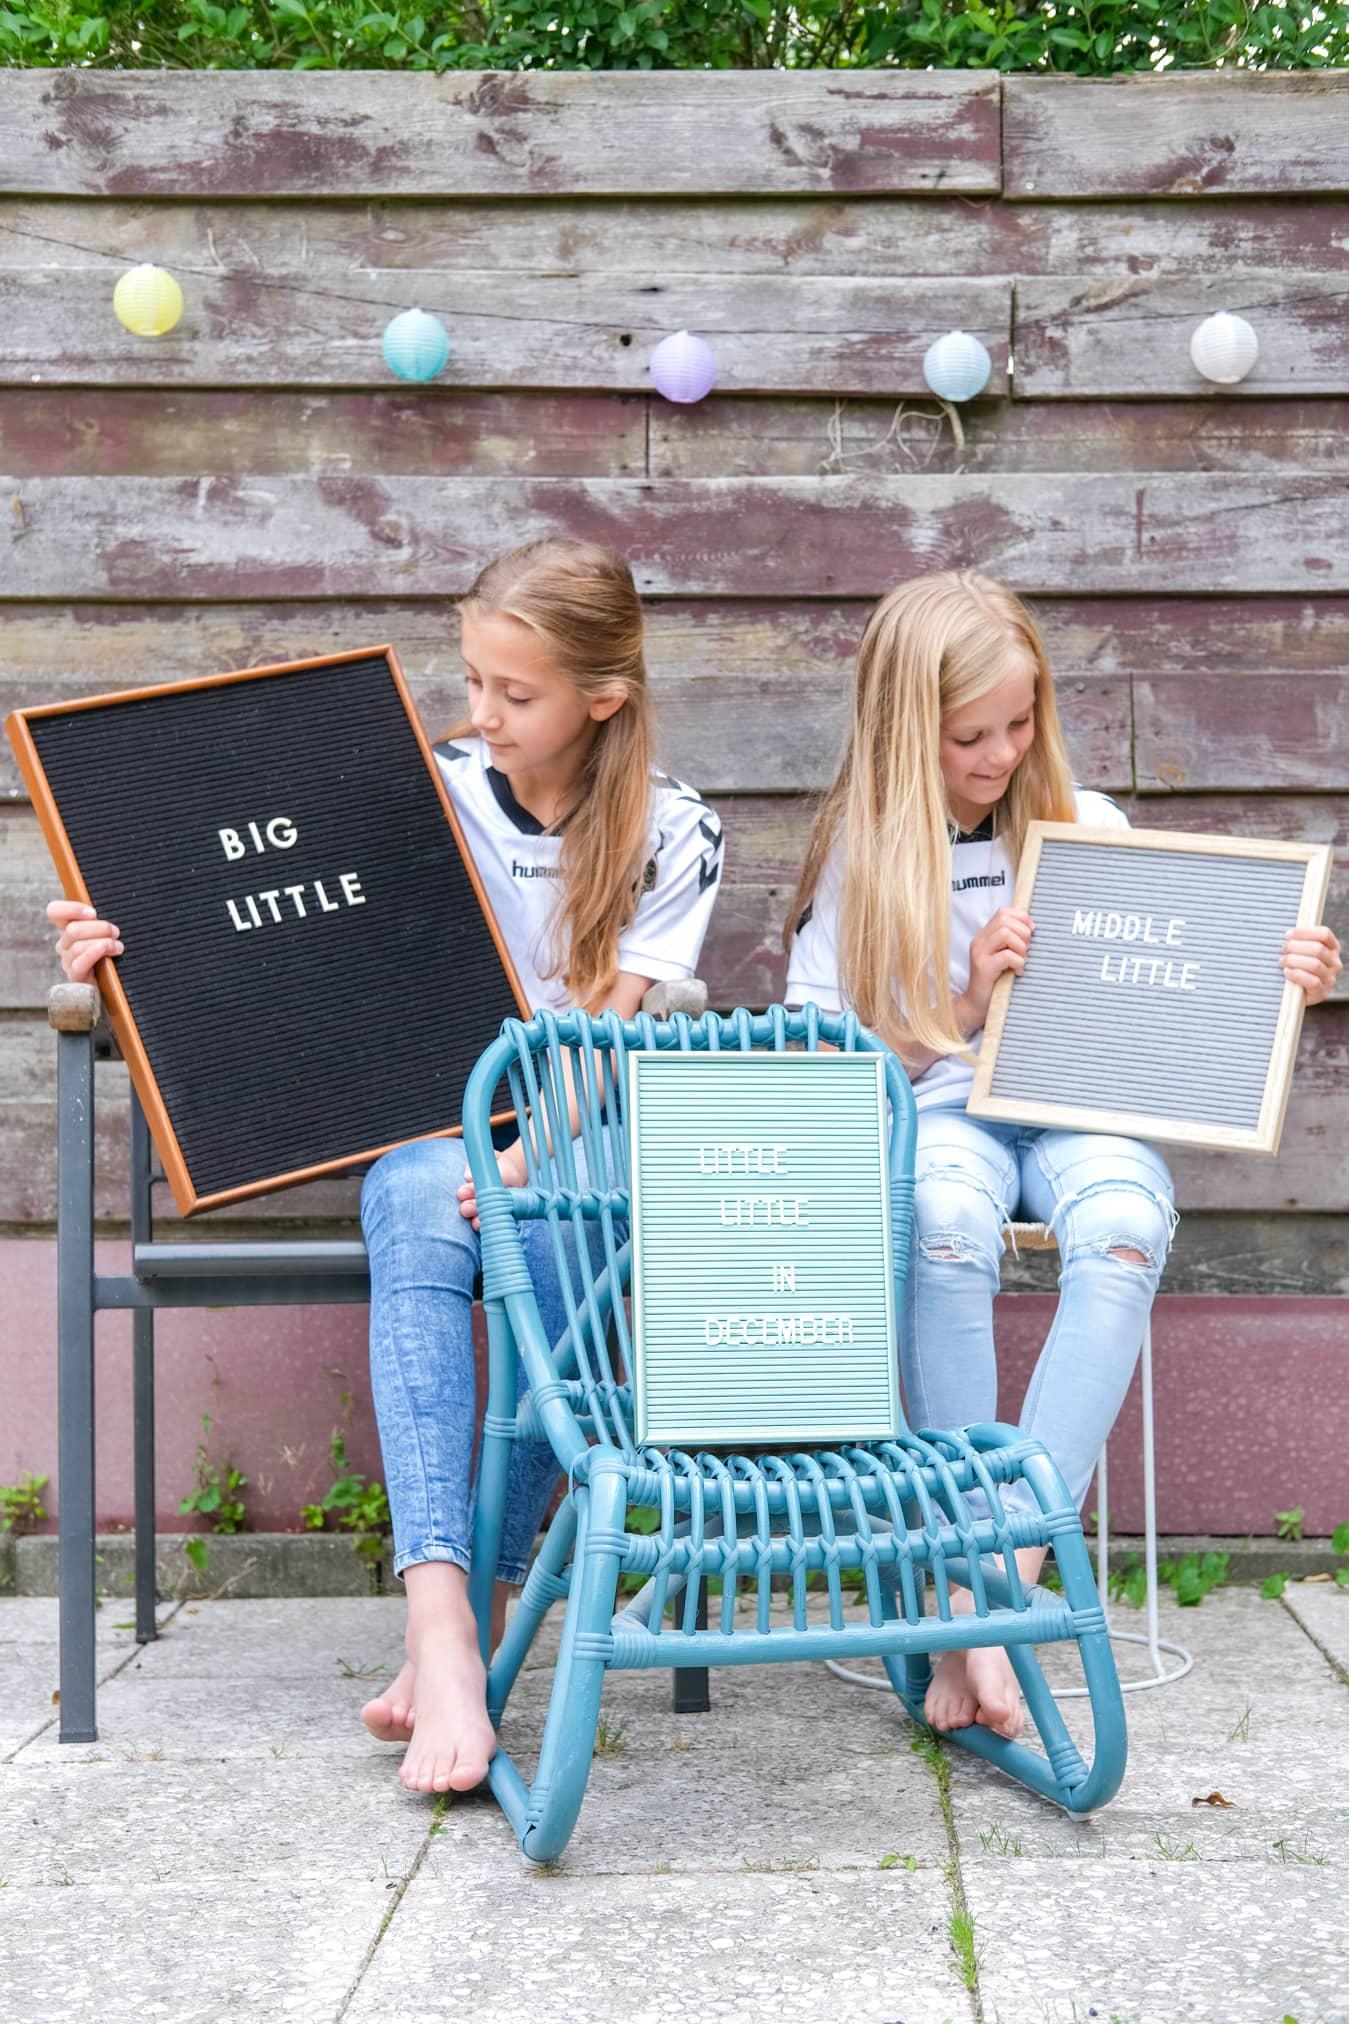 aankondiging grote zus baby nummer 3 letterbord